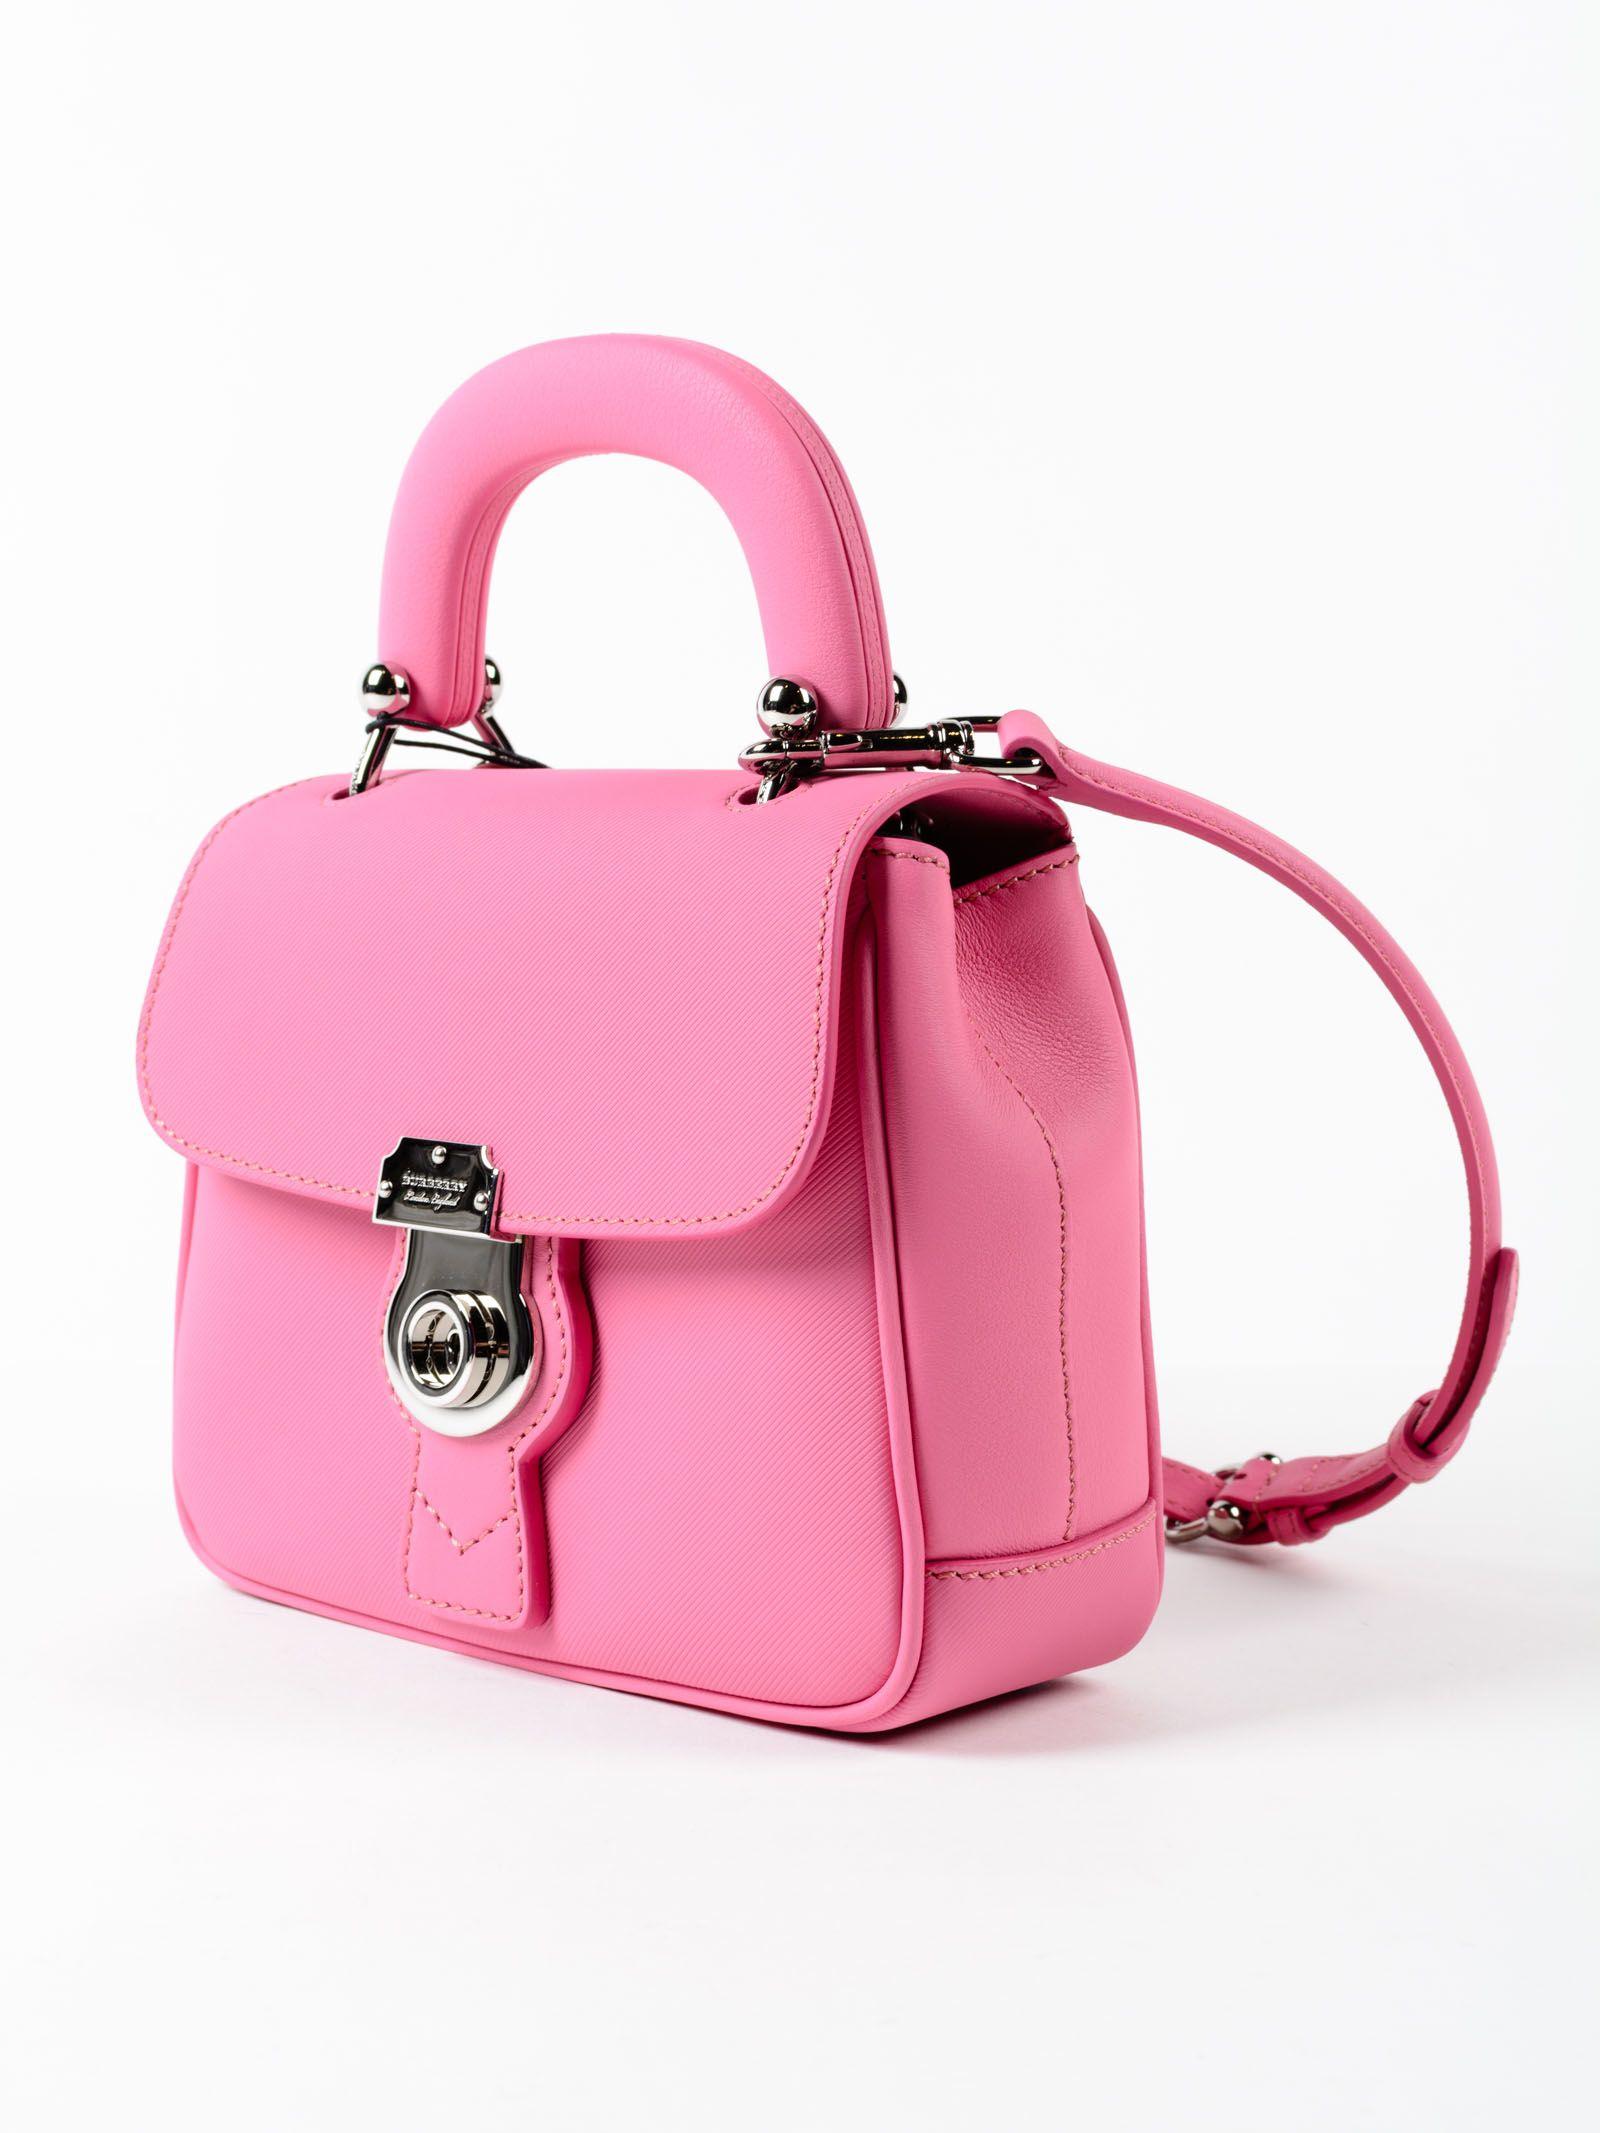 burberry bag pink